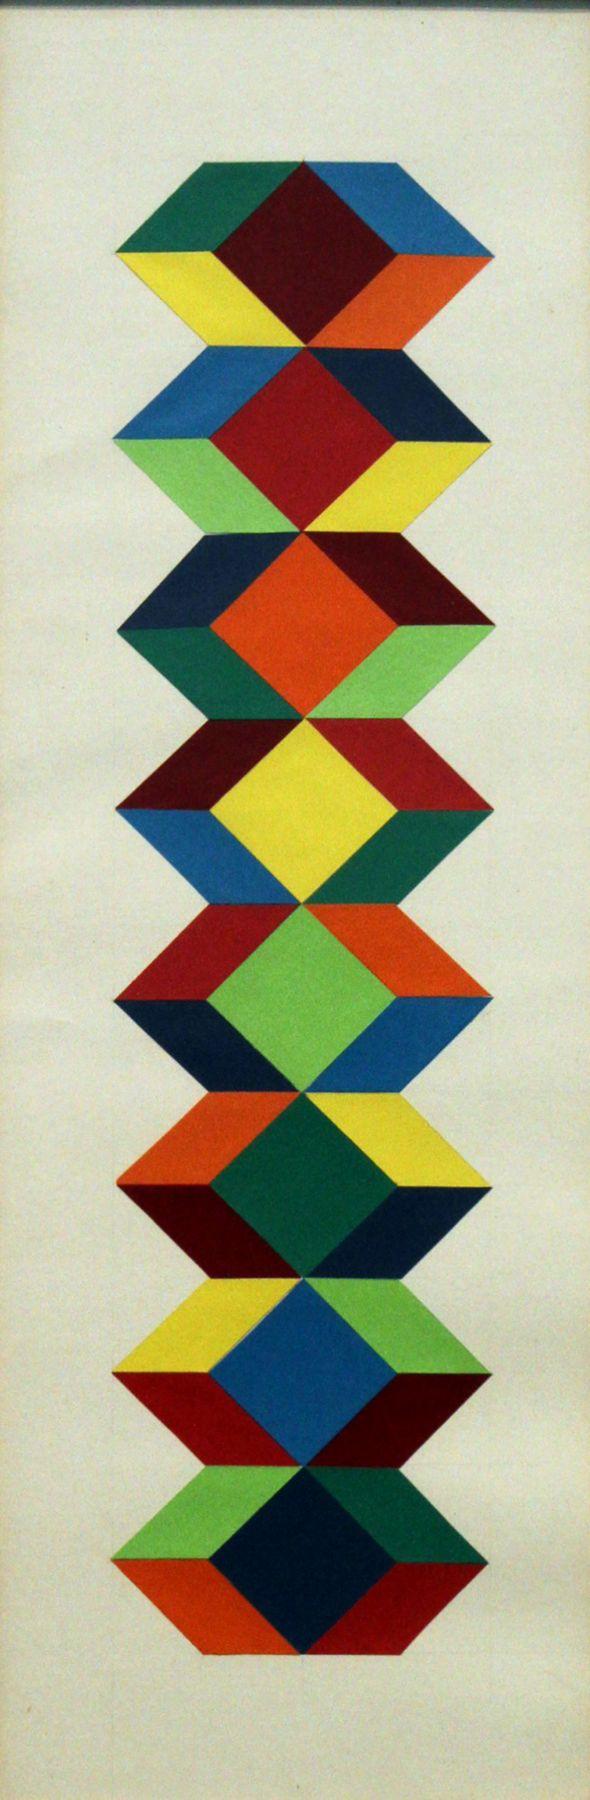 Francisco Sobrino,Untitled, 2003, collage,11 1/4 x 5 3/4 in. (28.6 x 14.5 cm.)